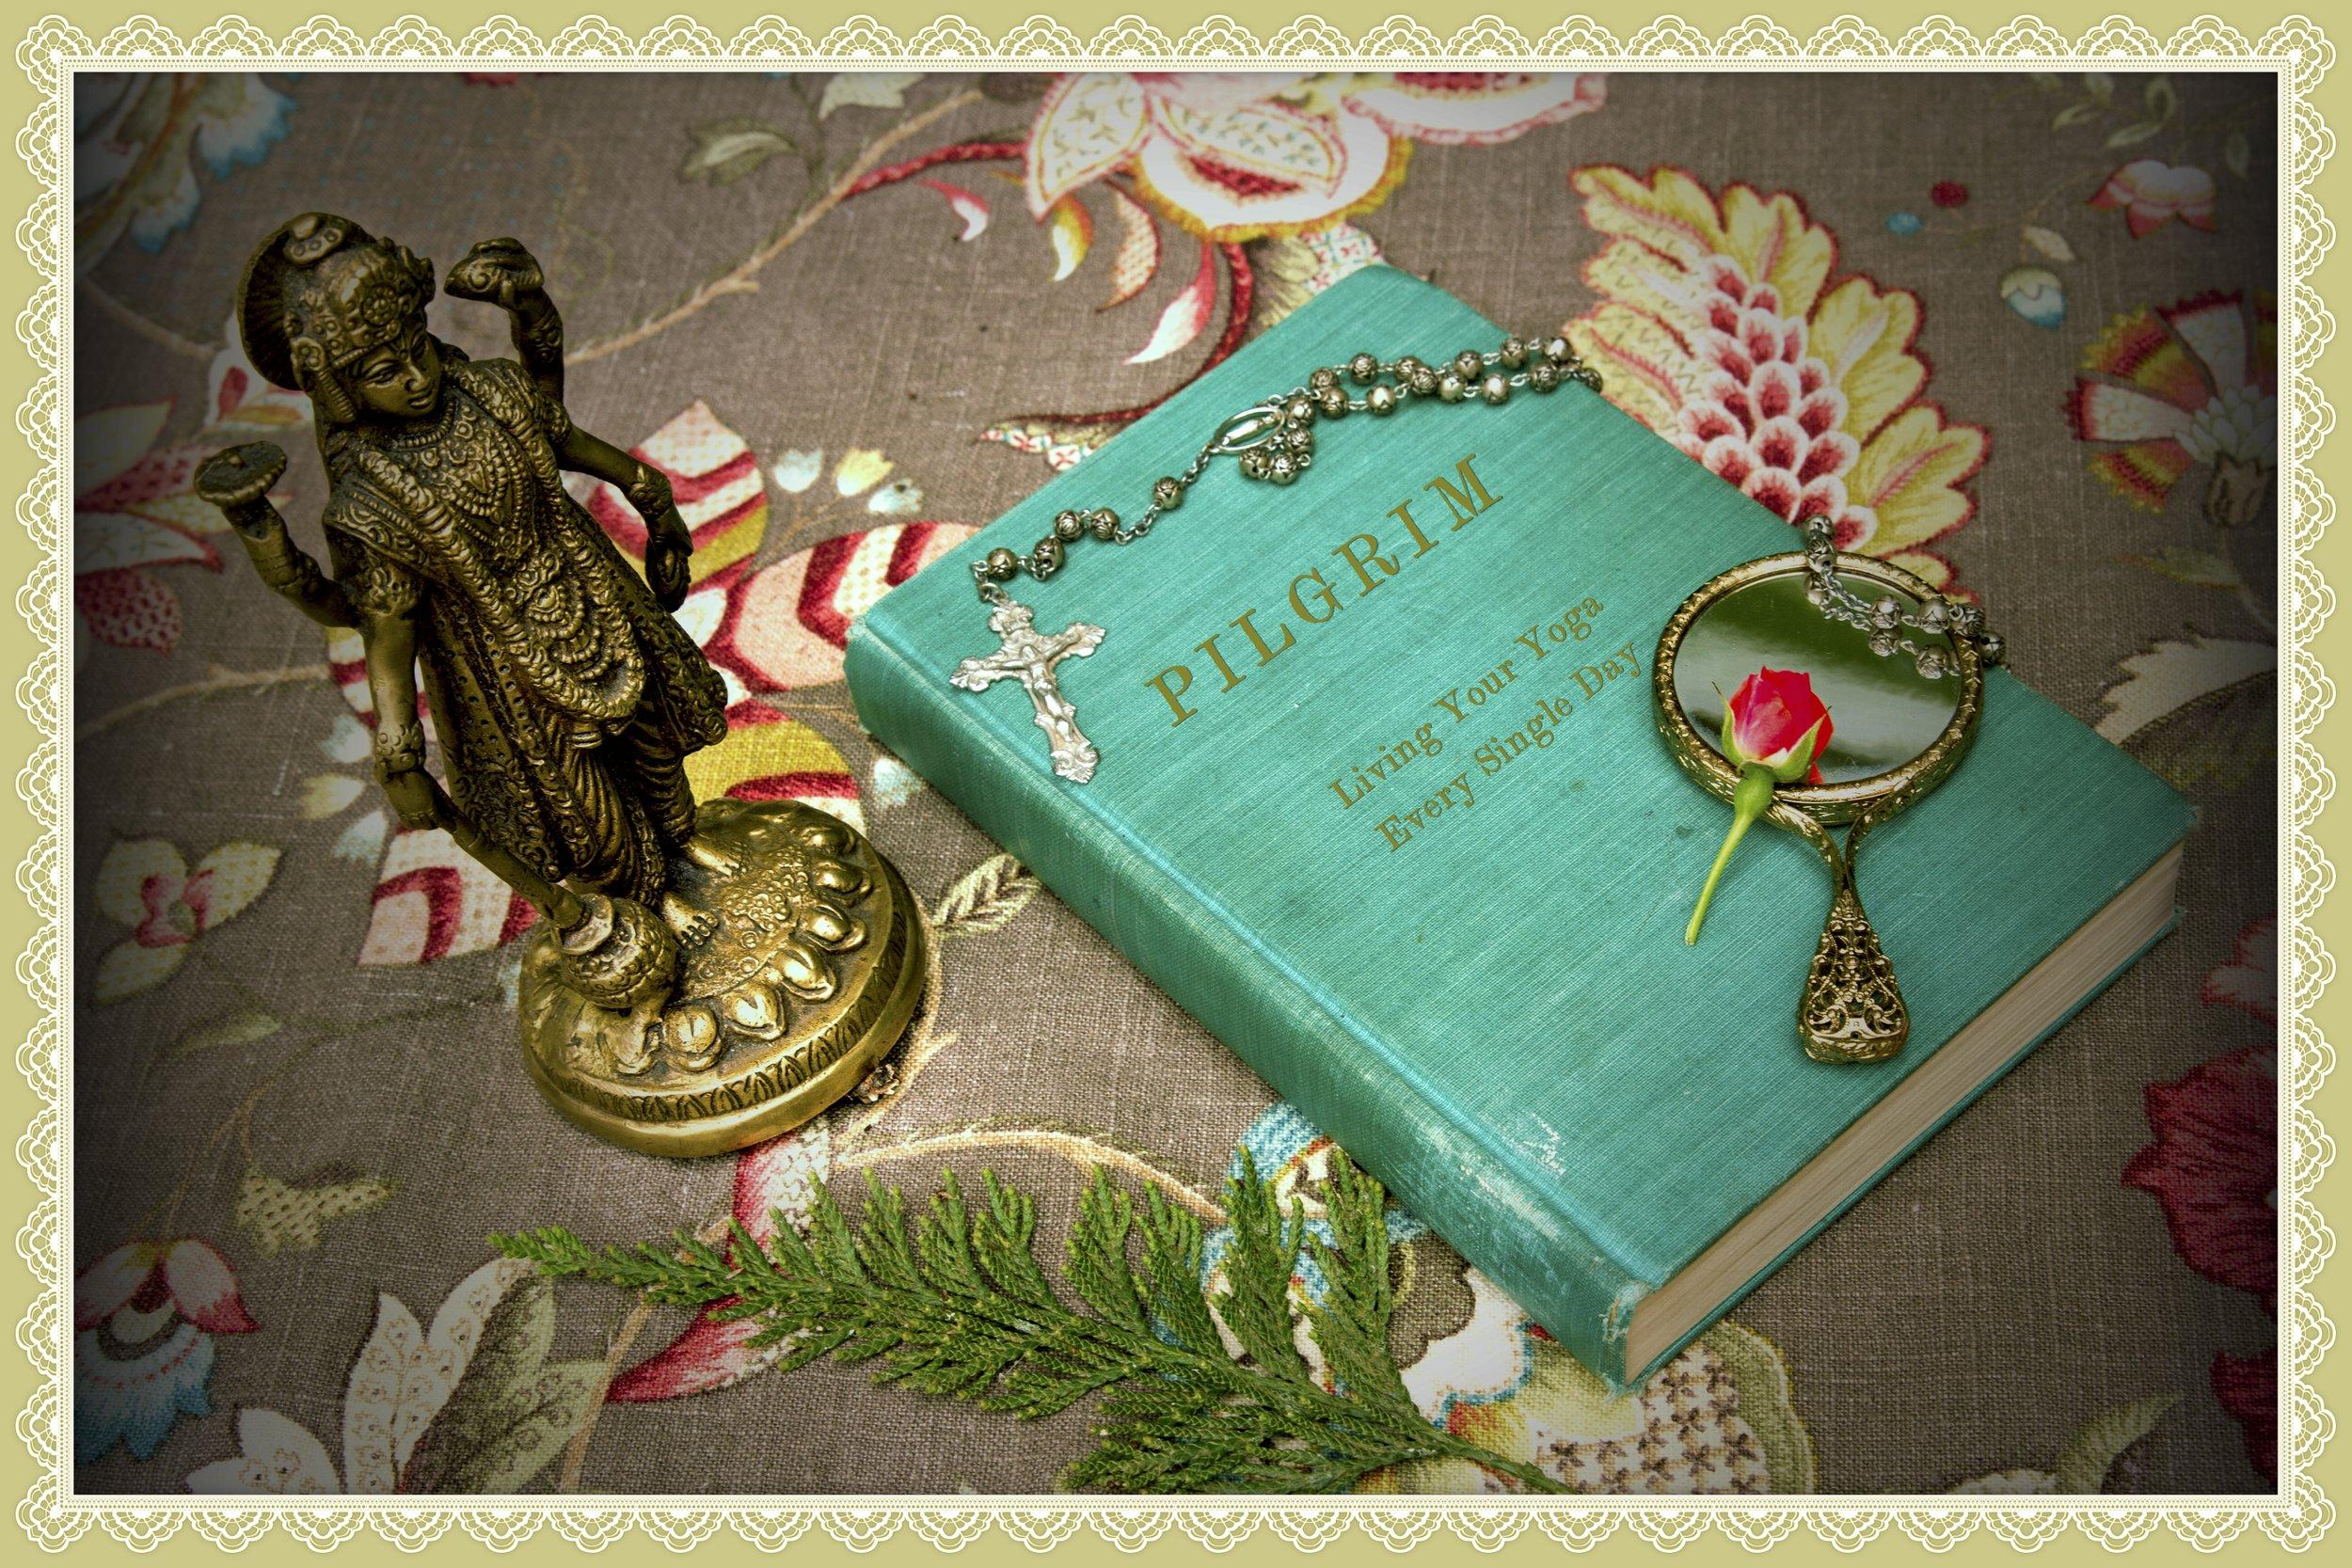 pilgrimbookcover.jpg